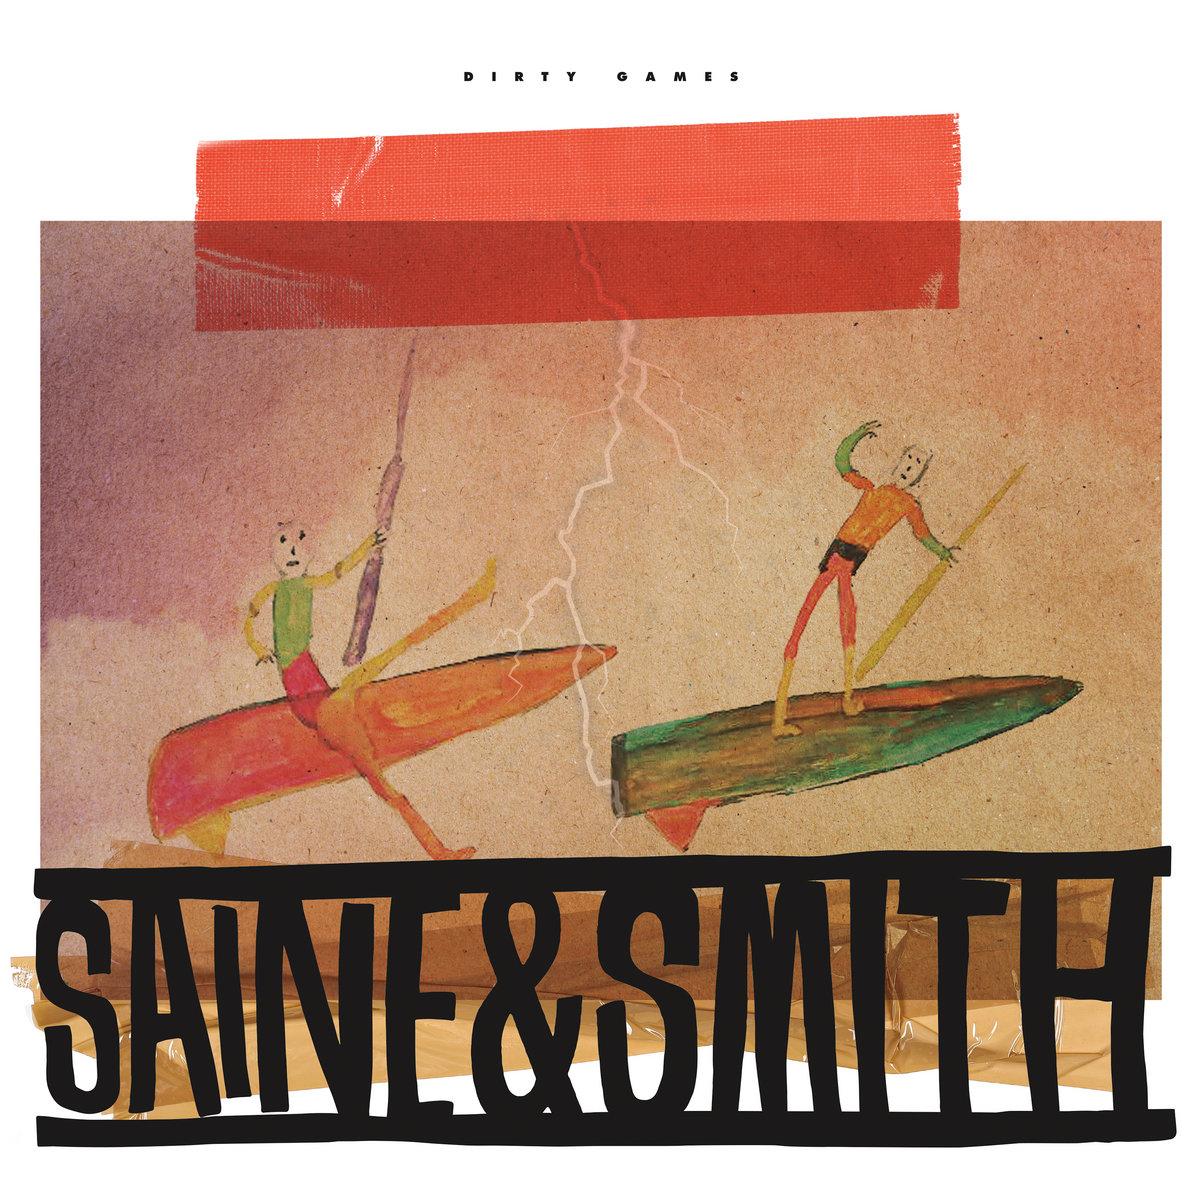 2MR-035 – Saine & Smith – Dirty Games EP